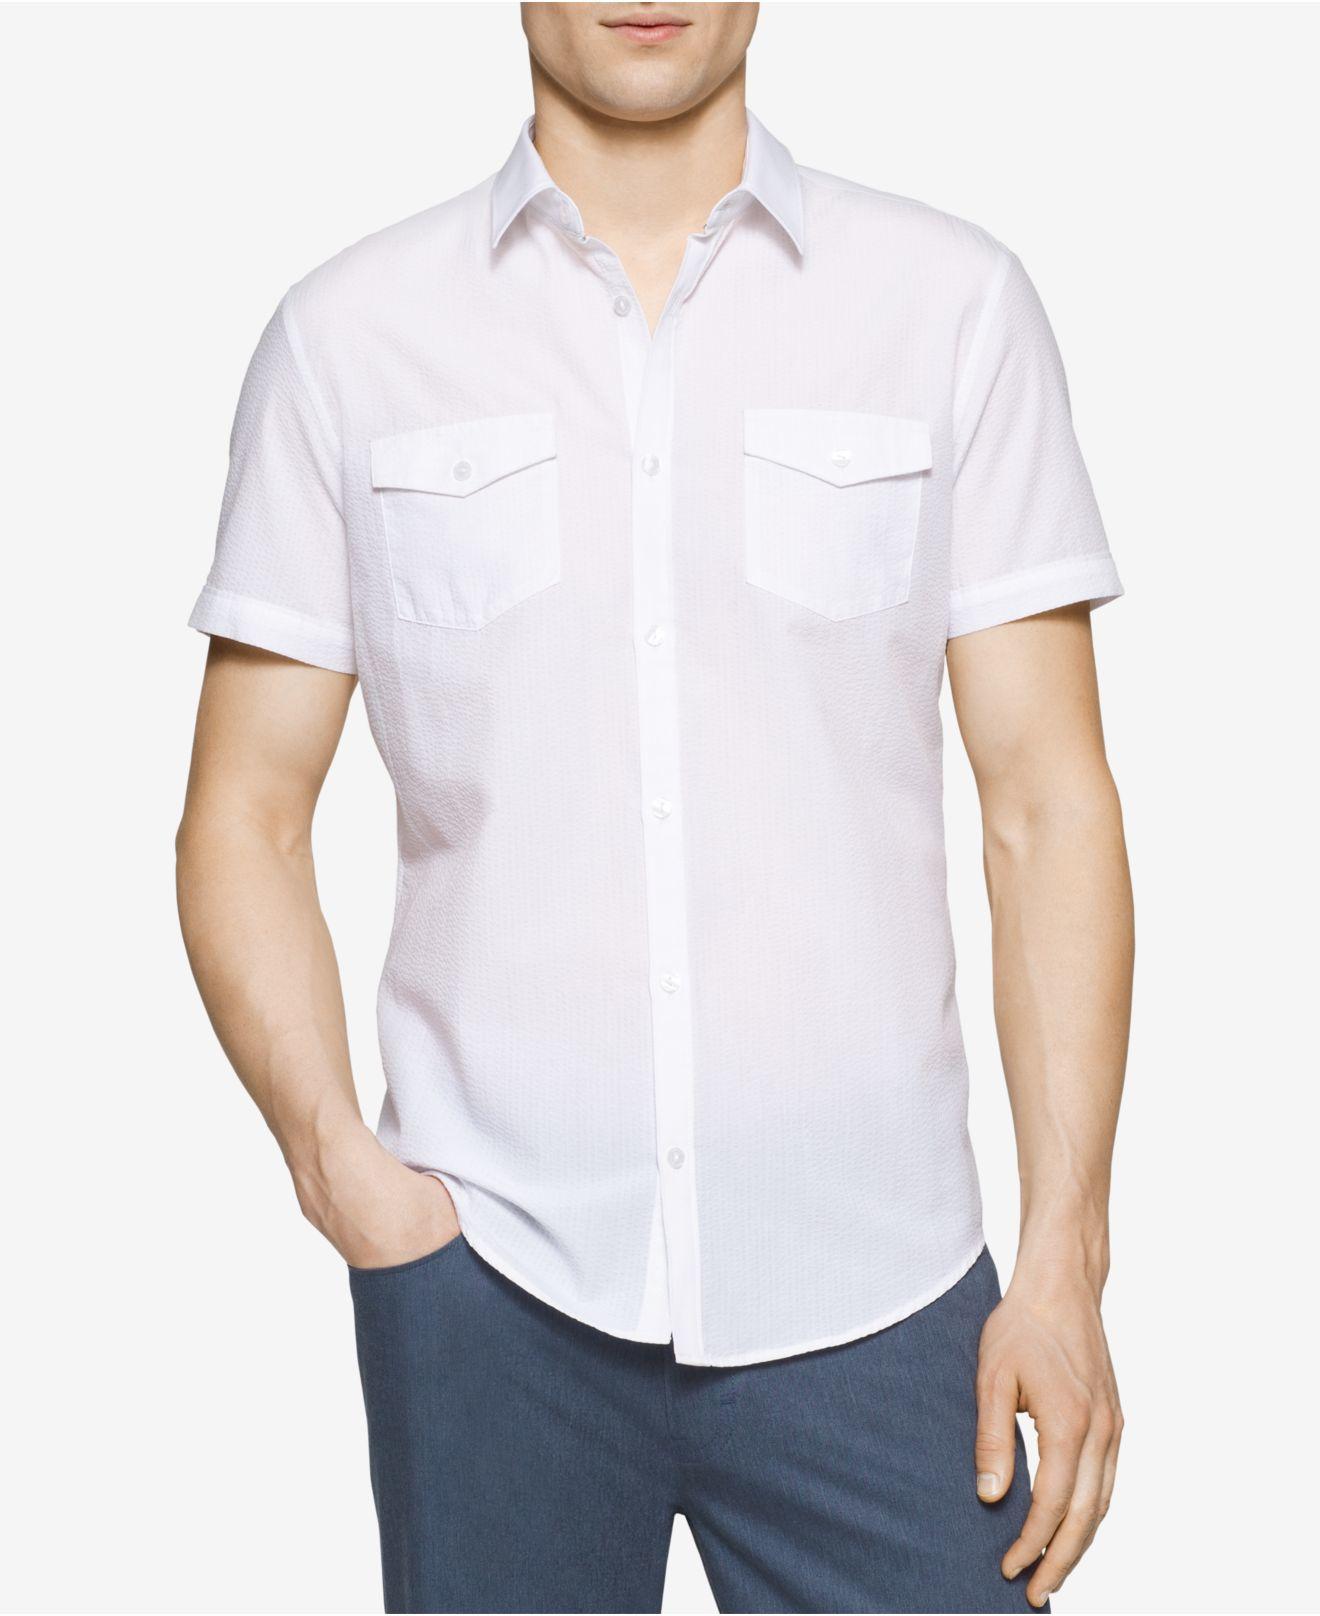 Calvin klein men 39 s slim fit textured short sleeve shirt in for Fitted short sleeve dress shirts for men